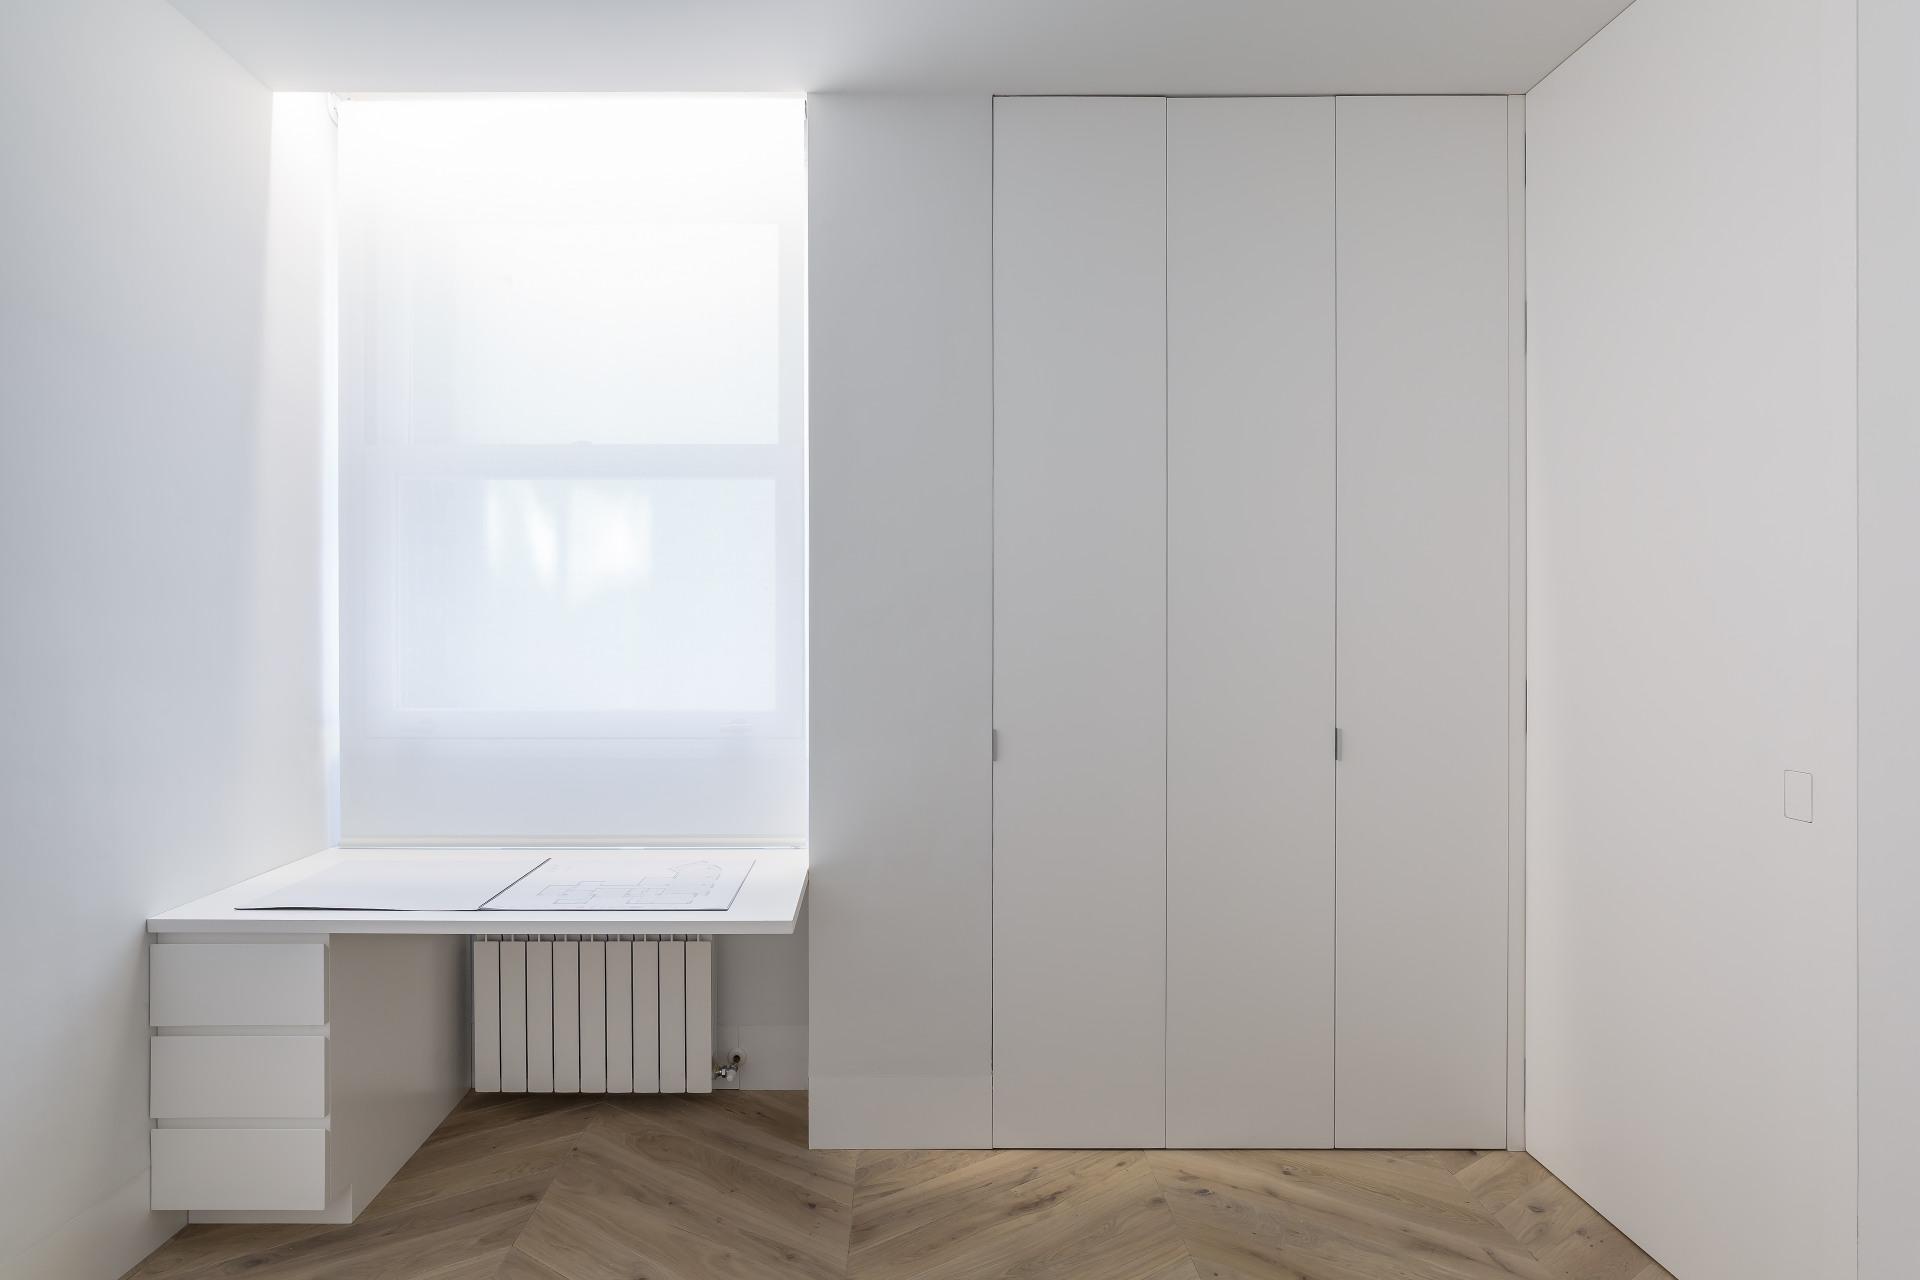 fotografia-arquitectura-valencia-german-cabo-gallardo-llopis-bfm-edificatoria-turia01 (8)